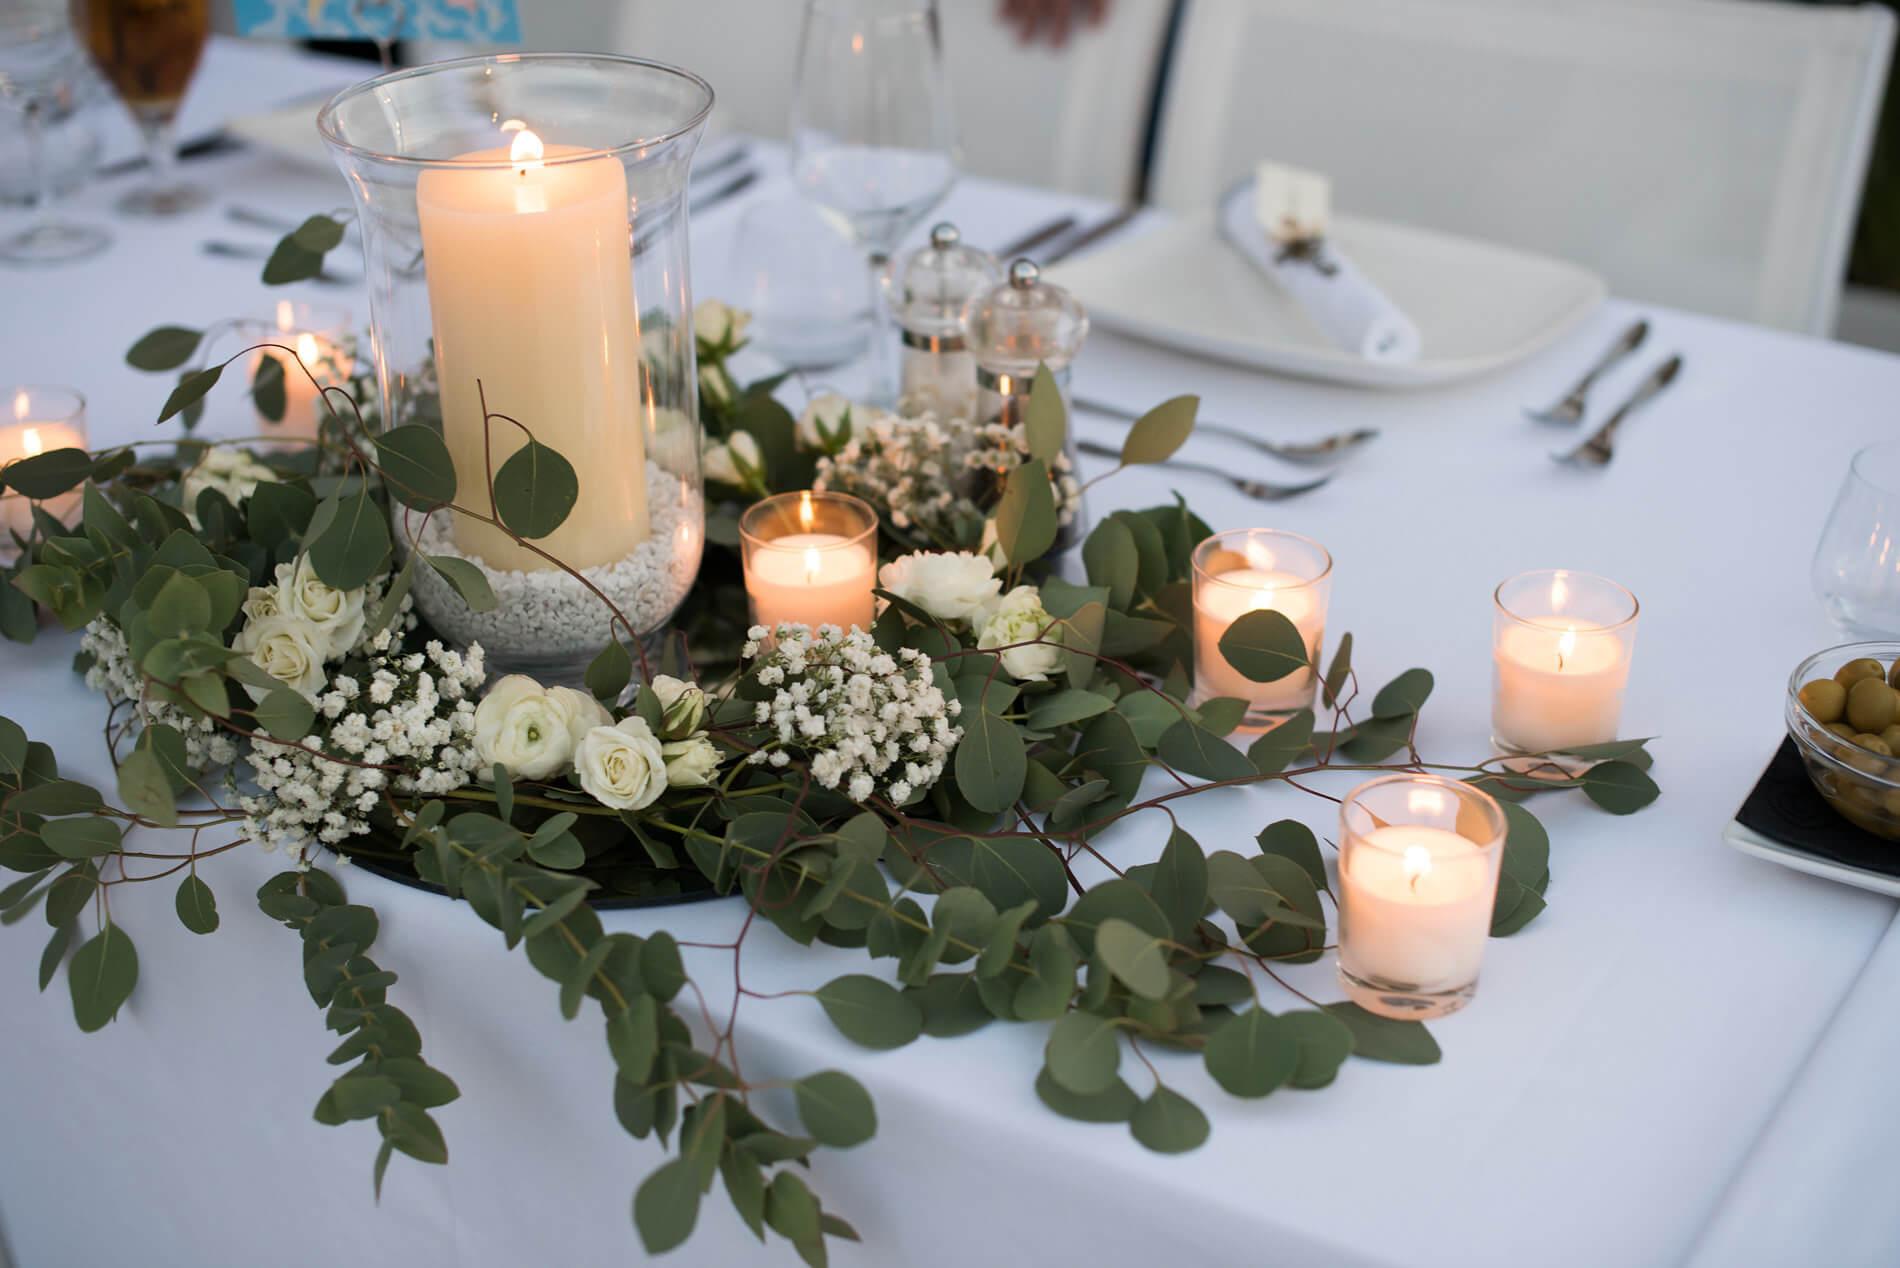 https://www.white-ibiza.com/wp-content/uploads/2020/03/ibiza-wedding-venue-maya-beach-club-2020-03.jpg